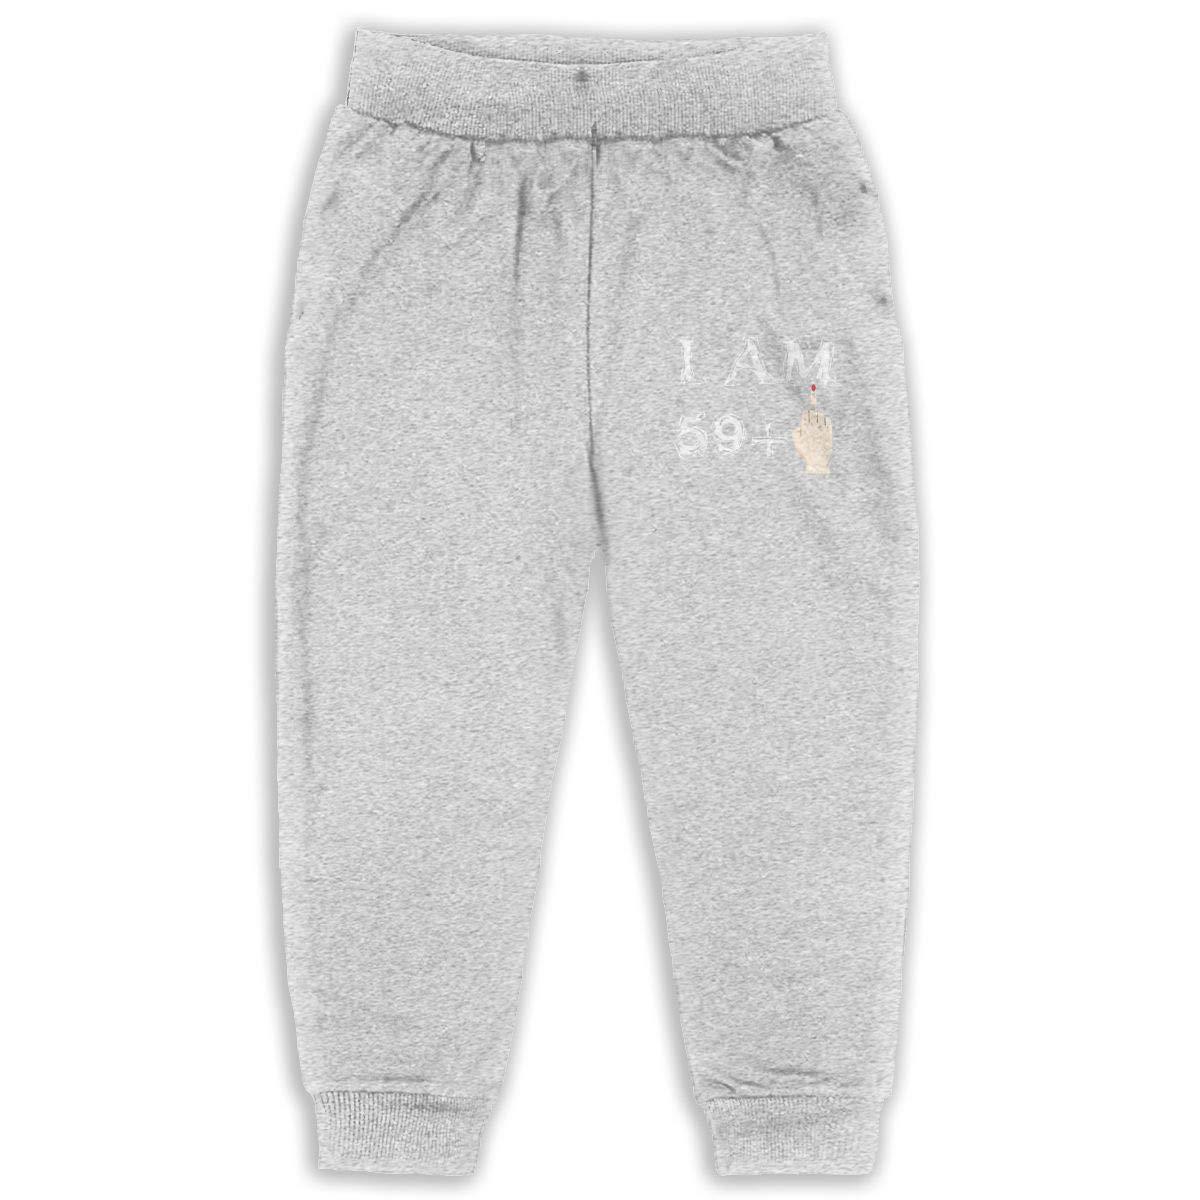 I Am 59 1 = 60 Years Old Birthday Kids Cotton Sweatpants,Jogger Long Jersey Sweatpants